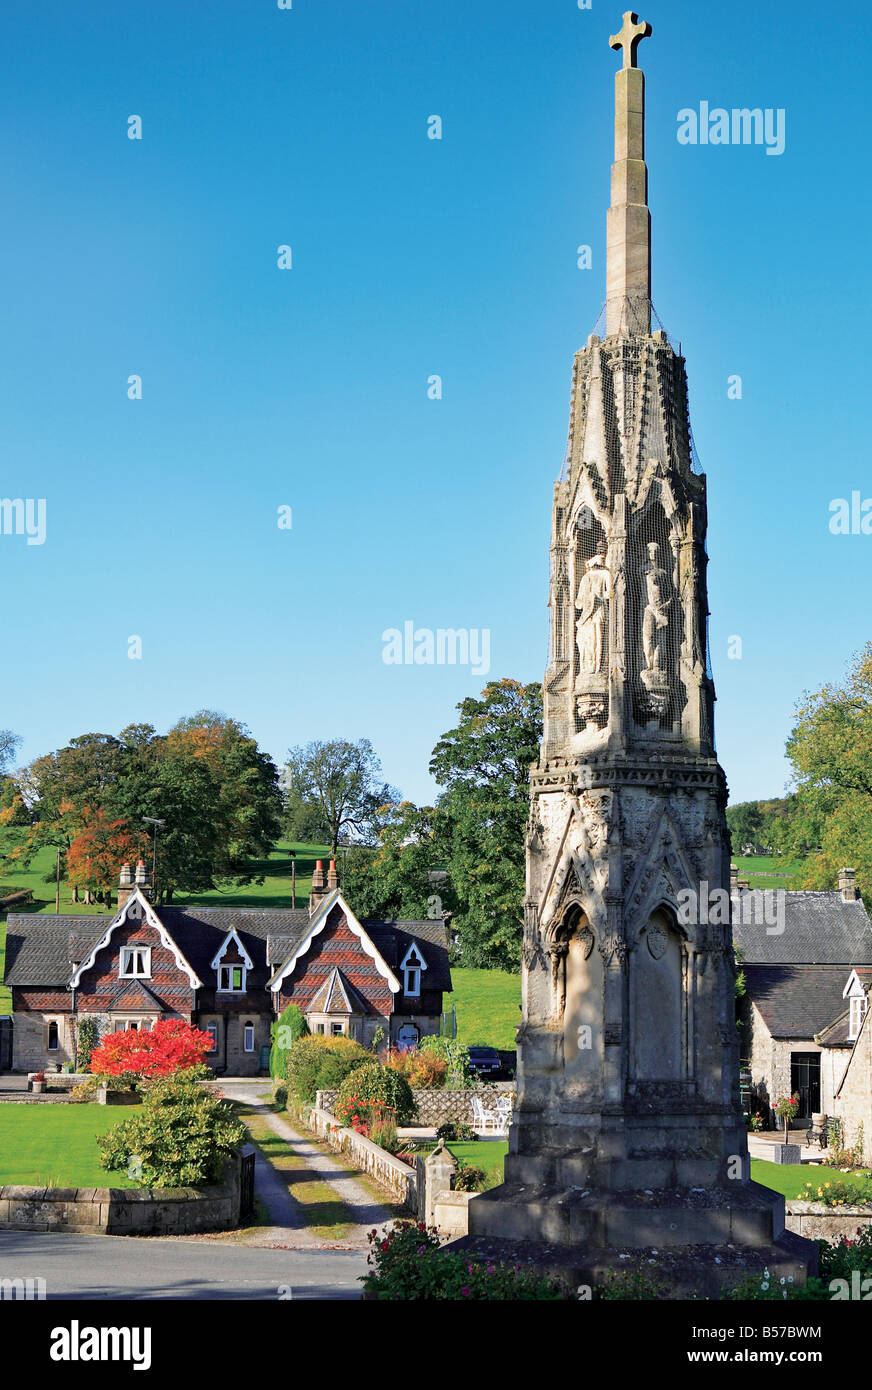 Ilam, memorial cross, Peak District National Park, Staffordshire,UK - Stock Image